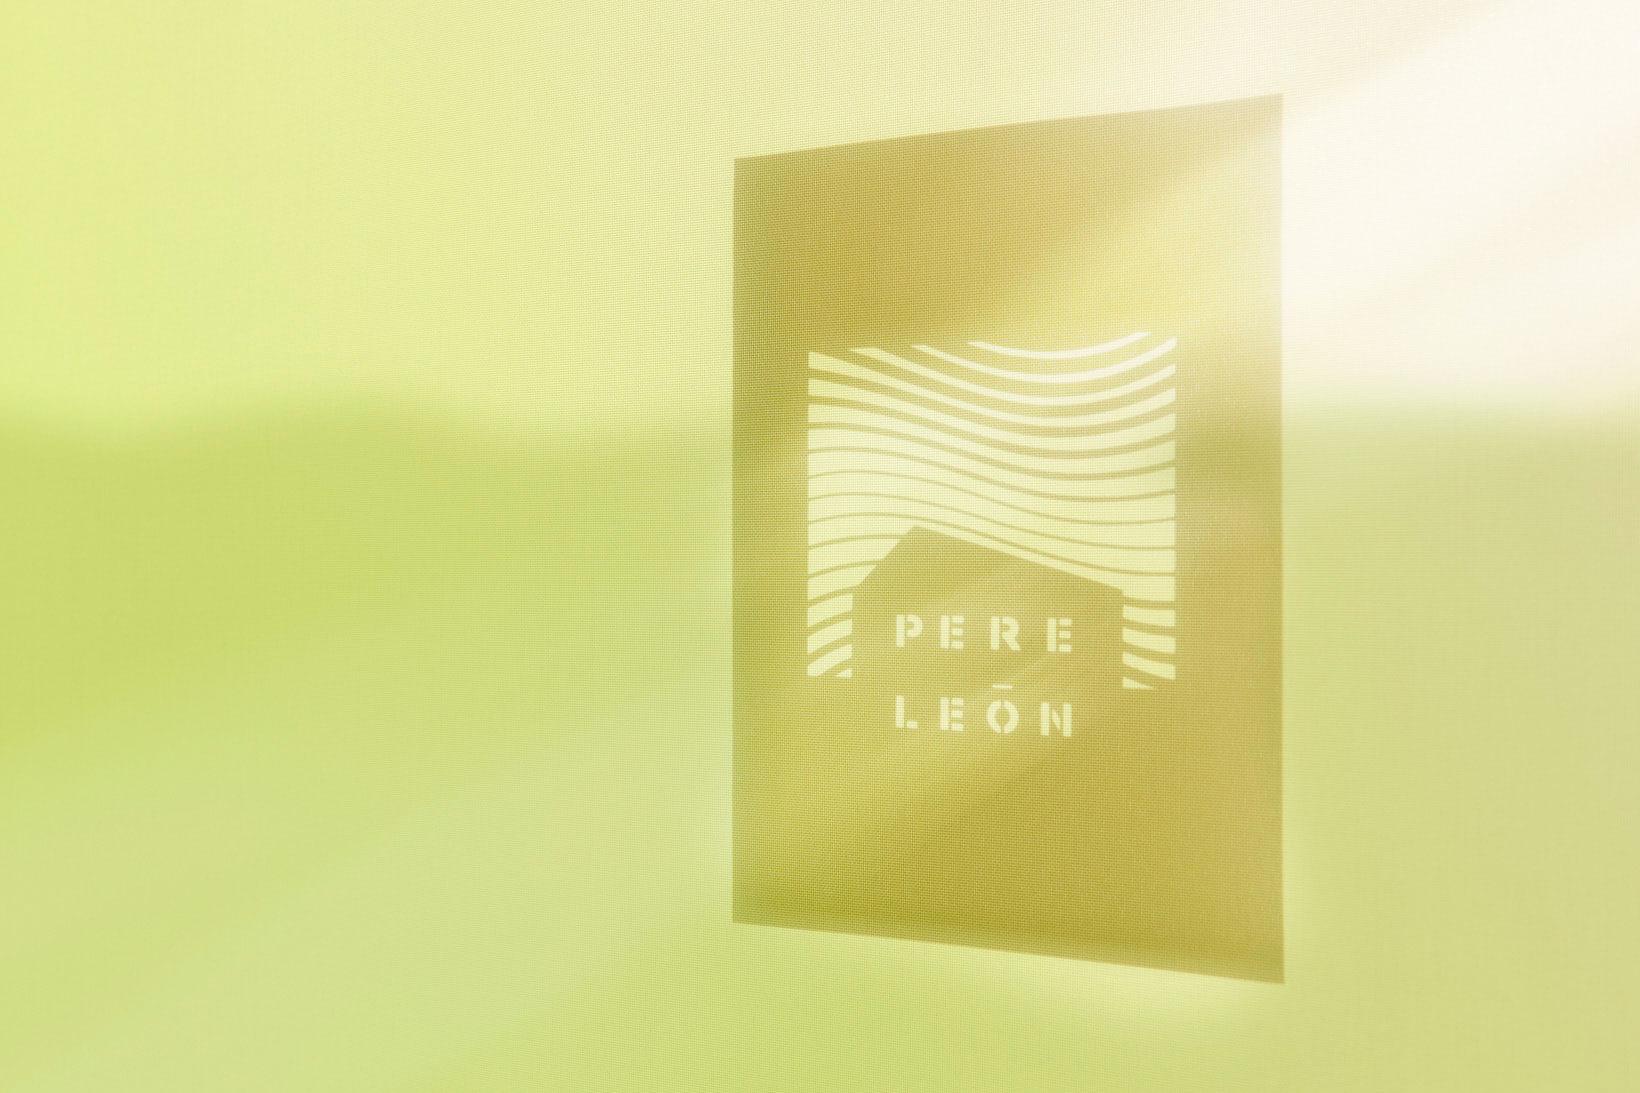 Branding logotipo diseño fotografía Pere Leon sombra reflejo